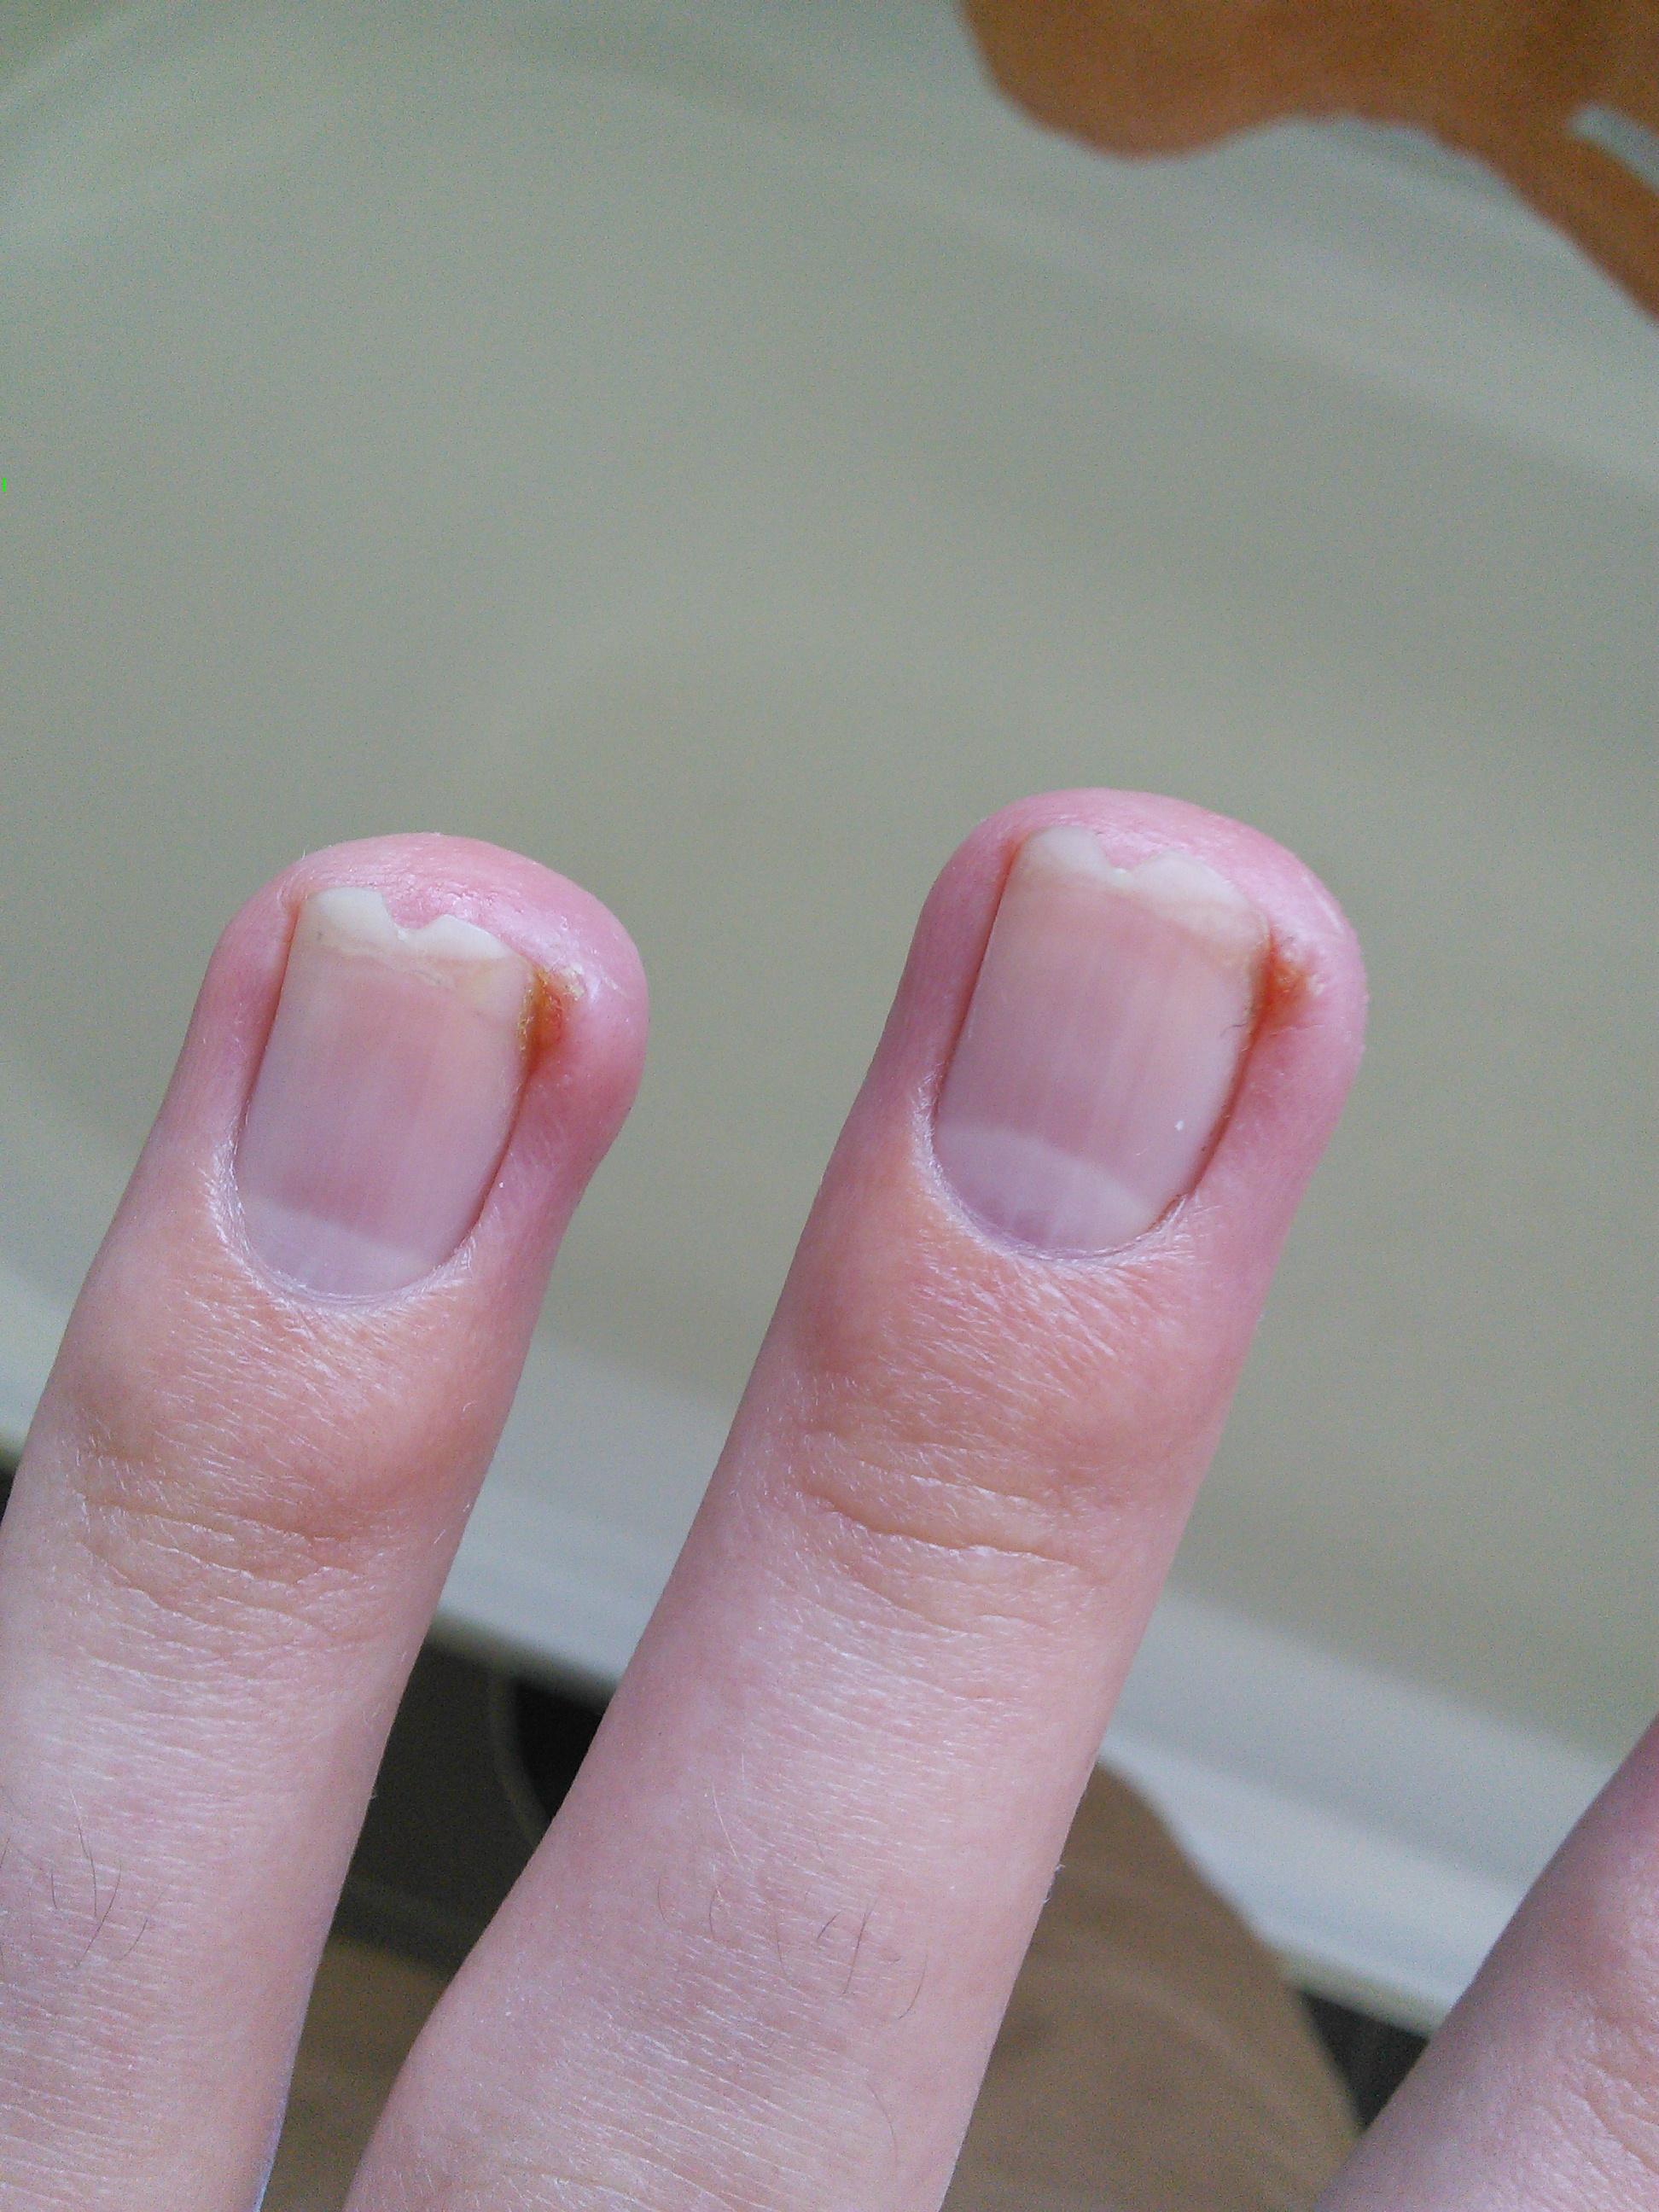 INGROWN FINGERNAIL GRANULATION TISSUE MONTH 4 OF 8 ACCUTANE  Prescription acne medications